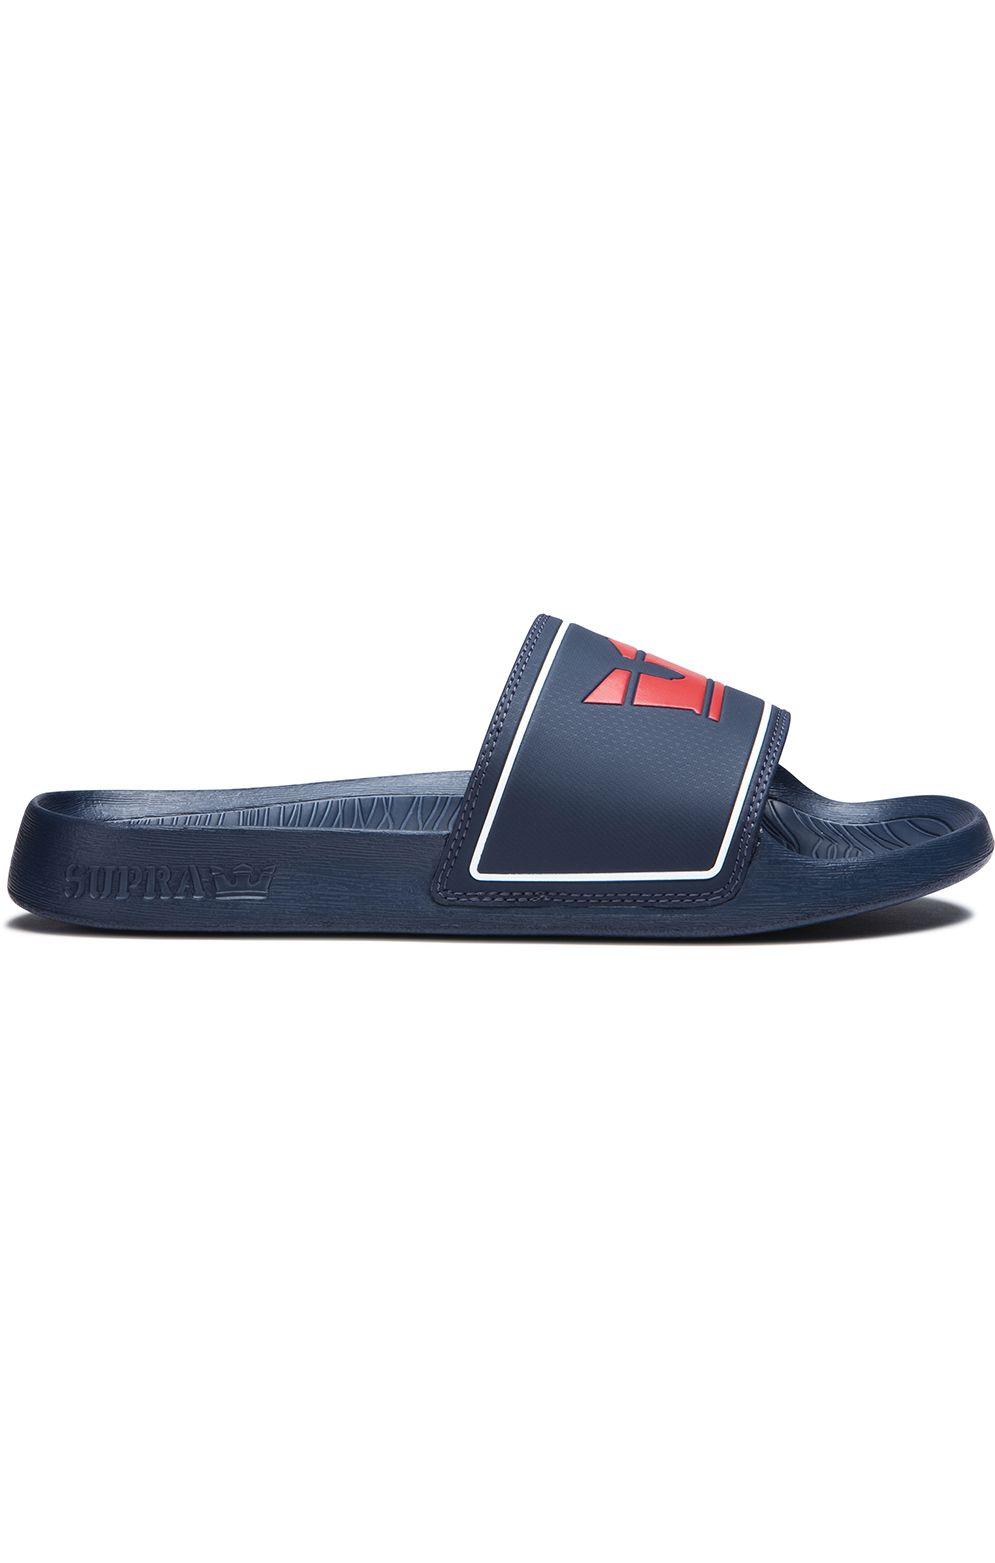 Supra Sandals LOCKUP Navy/Red